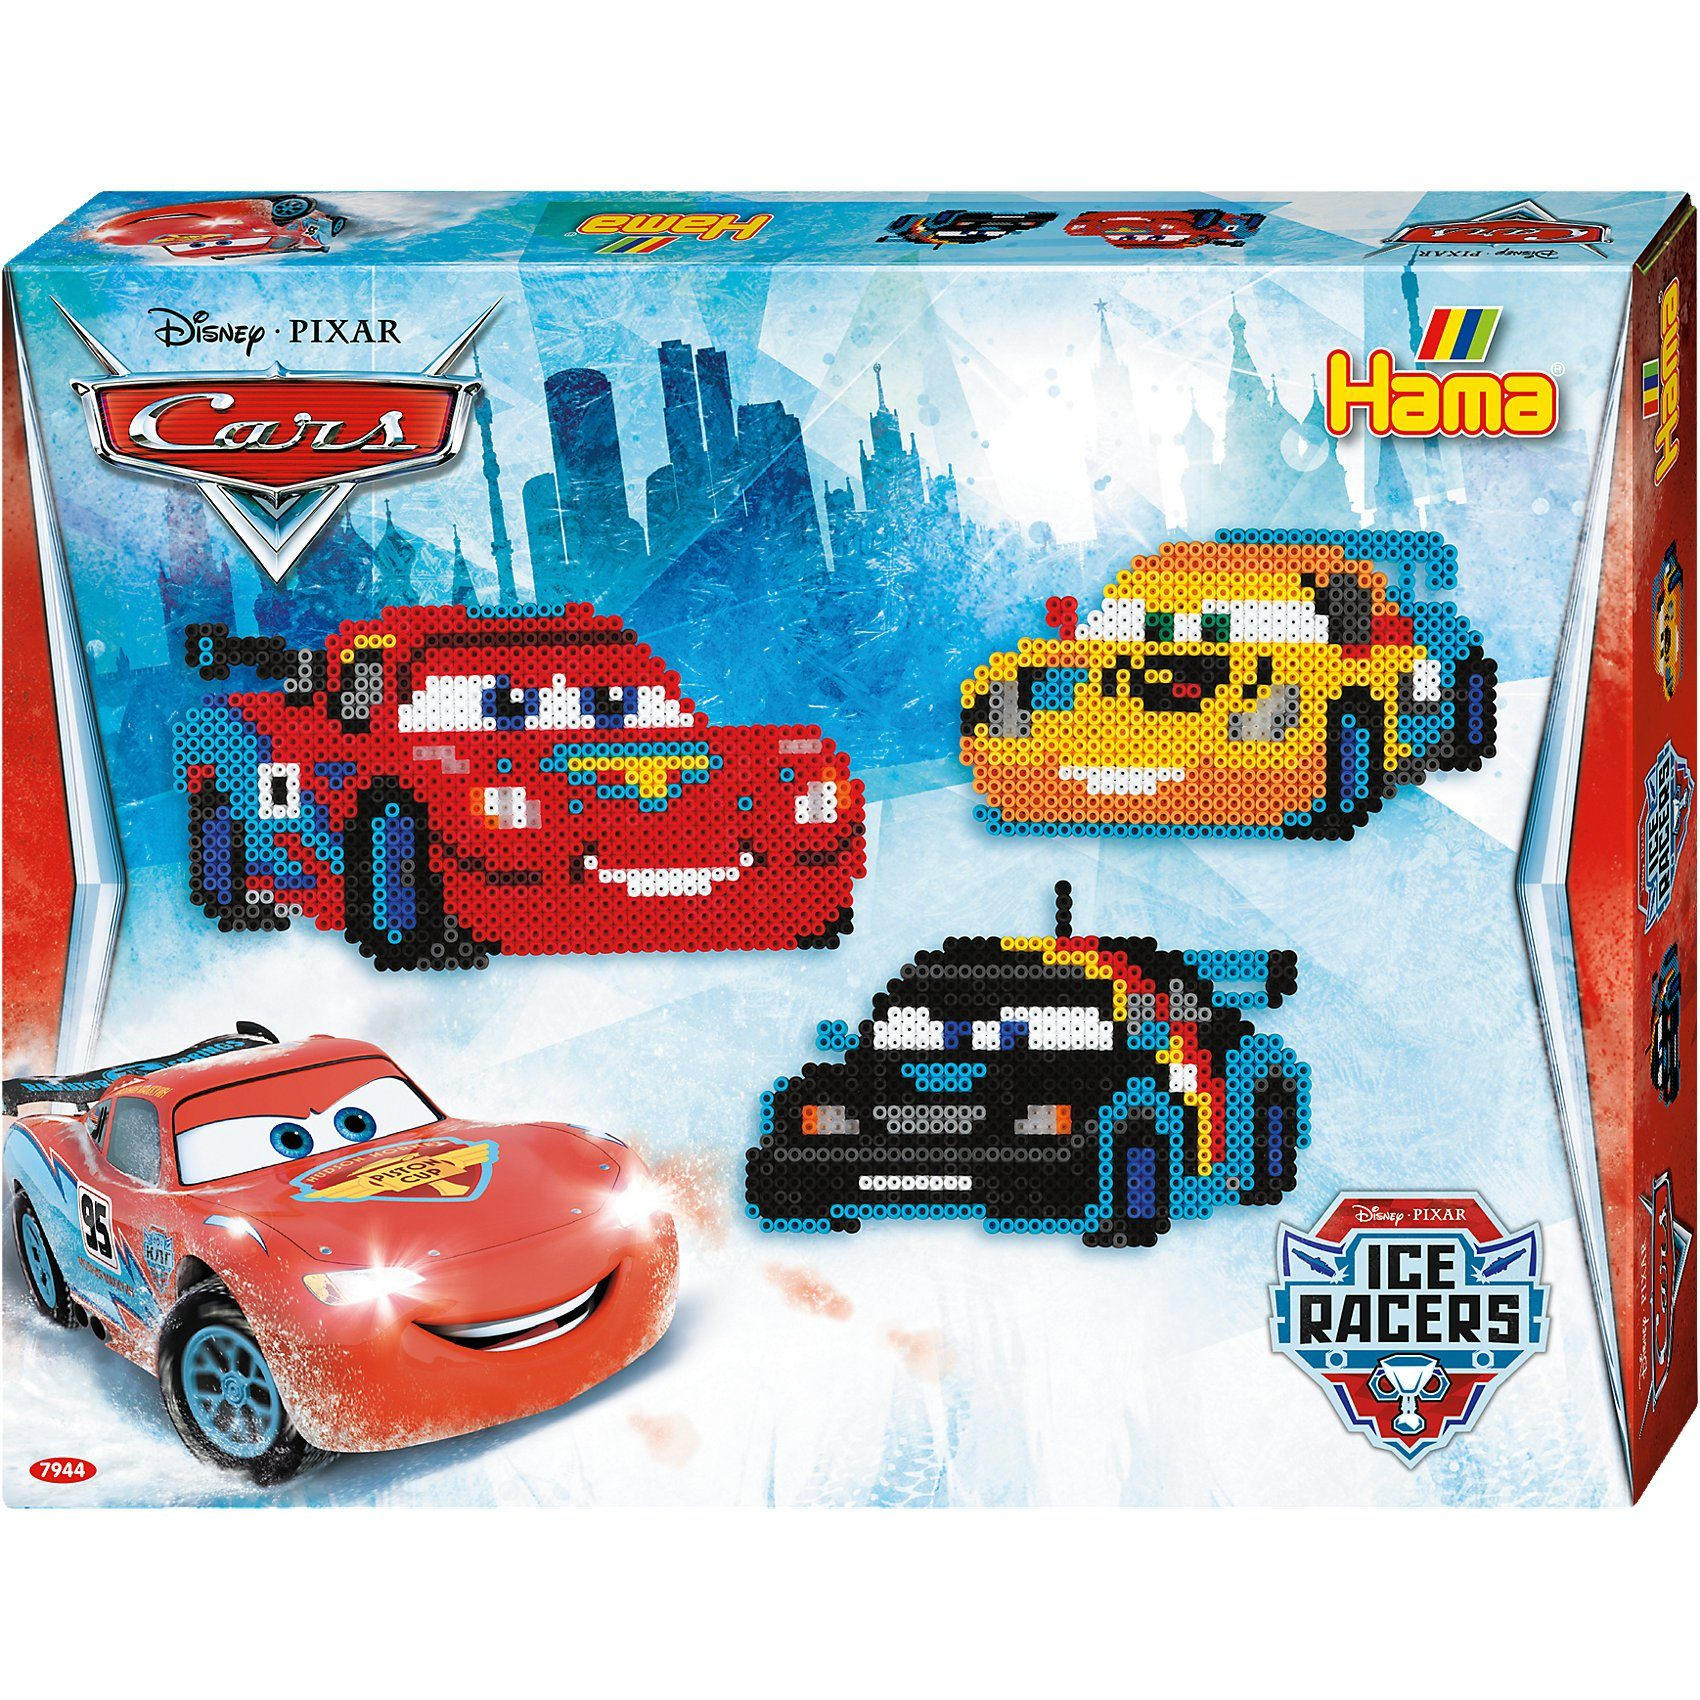 Hama Perlen HAMA 7944 Geschenkset Disney Cars, 4.000 midi-Perlen & Zubeh